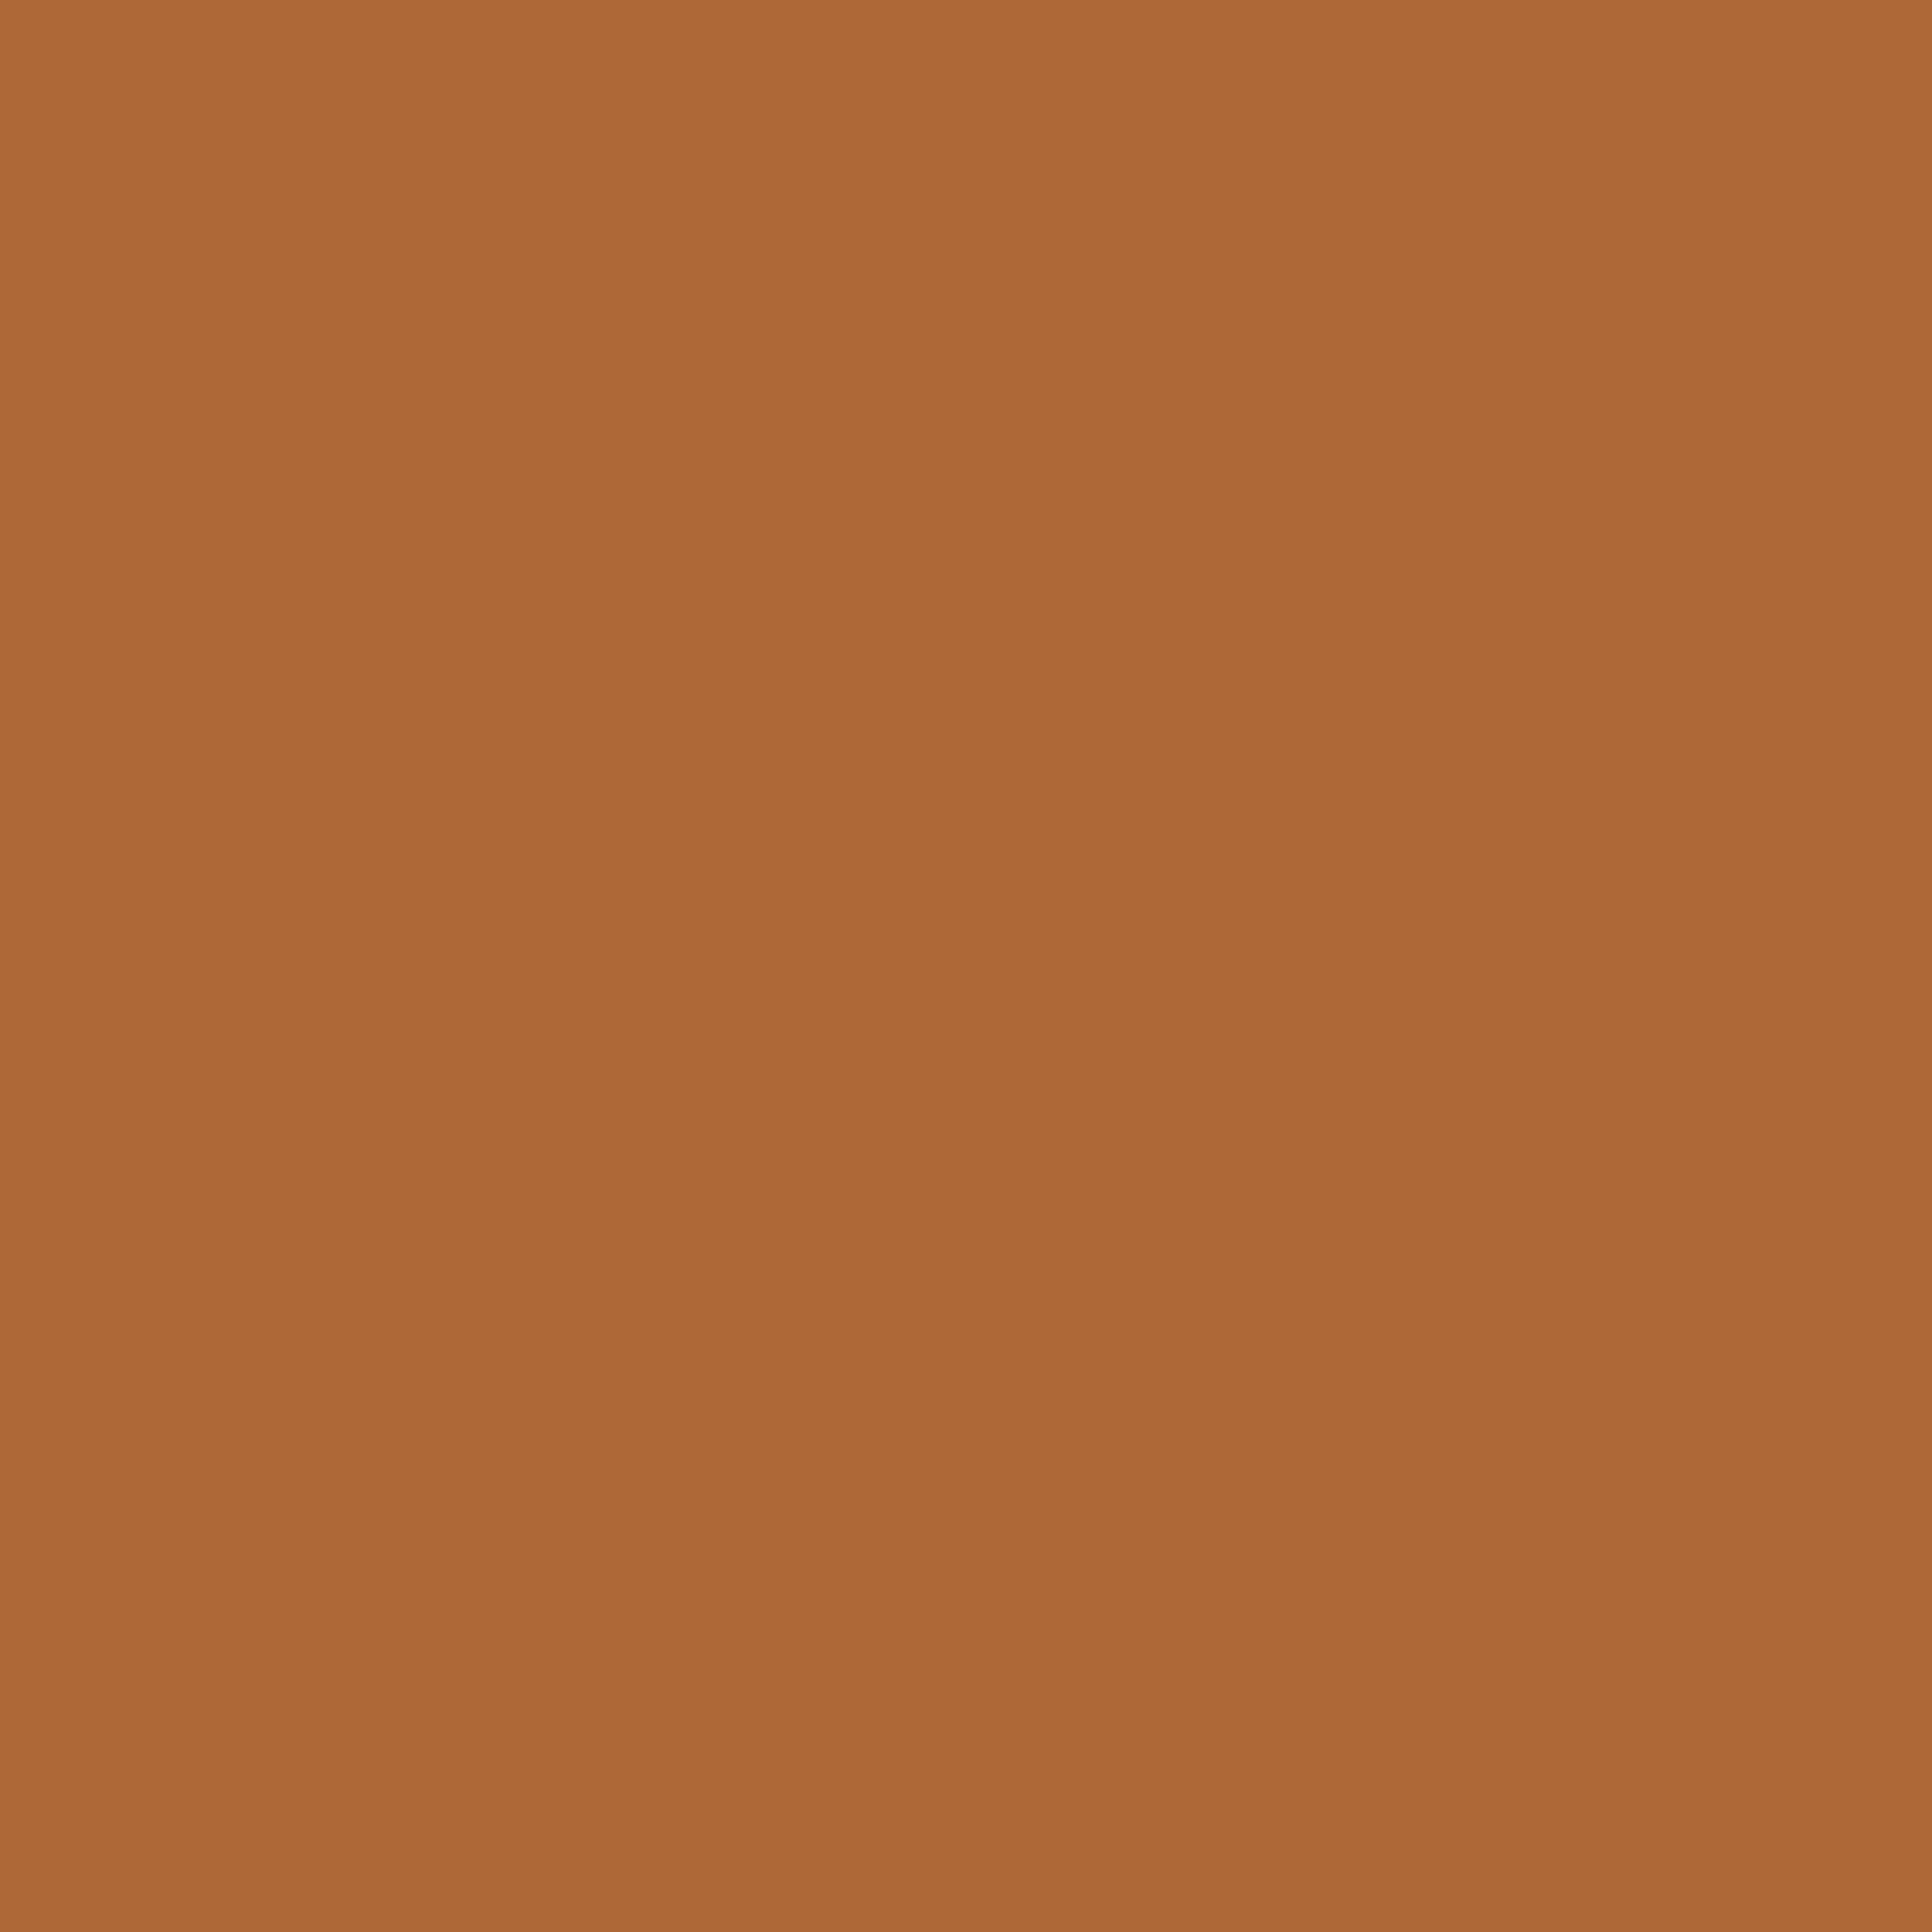 X Windsor Tan Solid Color Background